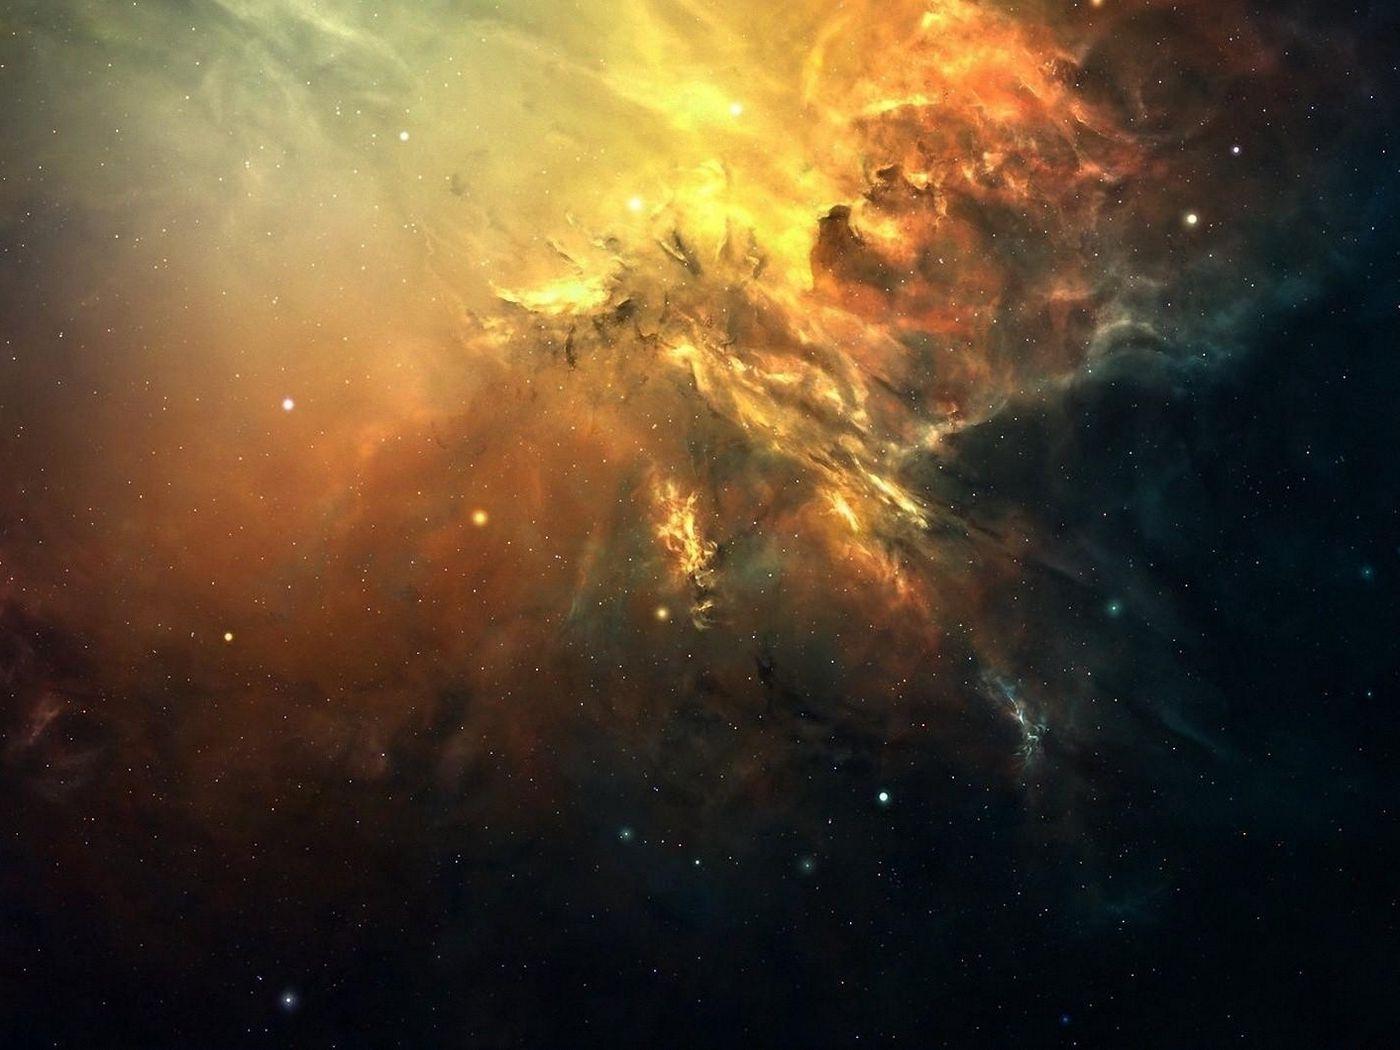 1400x1050 Wallpaper galaxy, space, light, stars, nebula